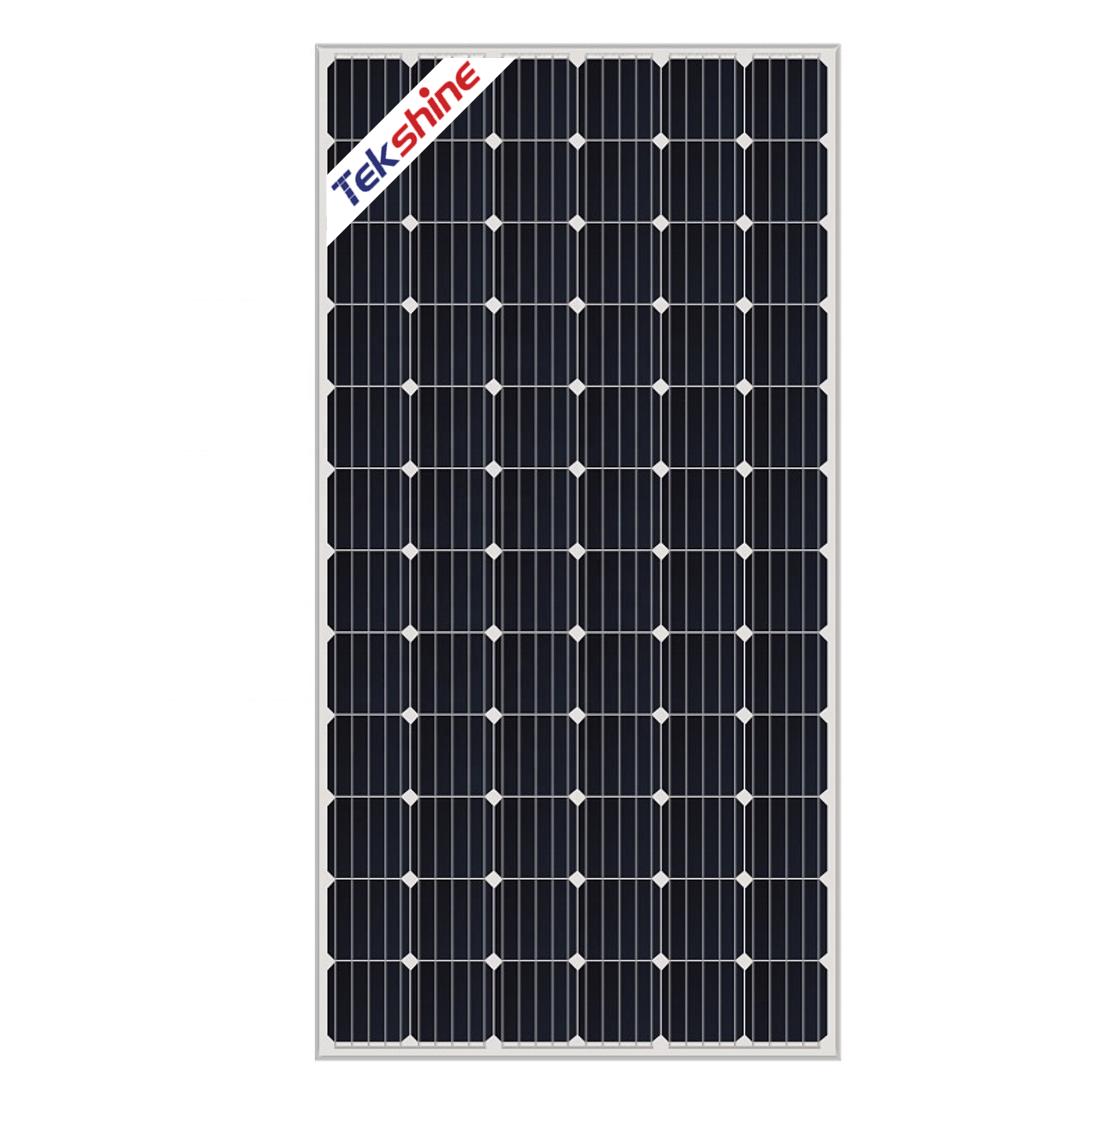 Tekshine beliebtesten hohe qualität ausdauernd 365w 370watt 375watt 72 zellen zug alibaba tekshine solar panel